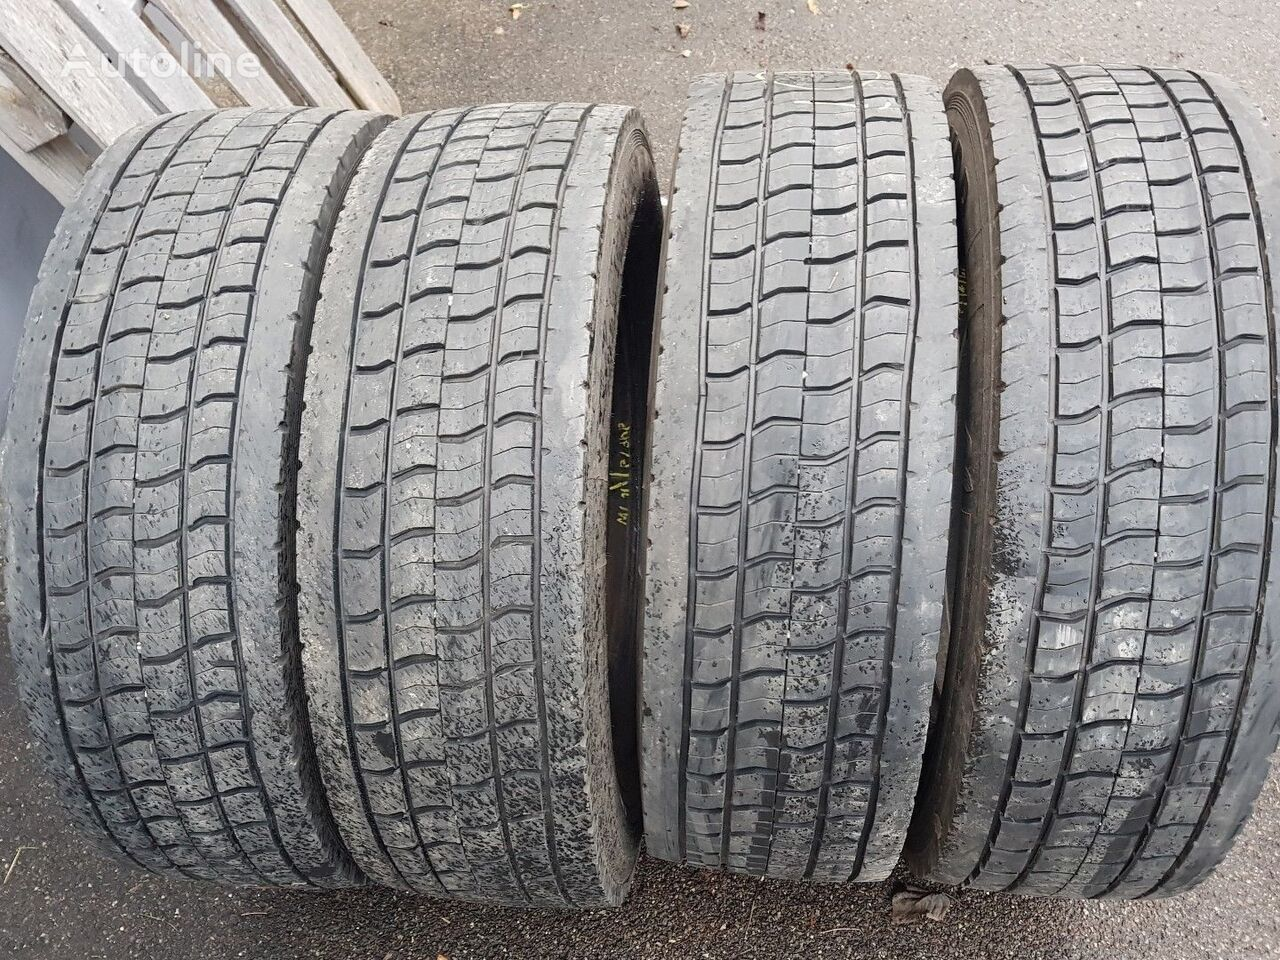 pneu de camionnette 265/70R19,5 * 285/70R19,5 * 305/70R19,5 Gebrauchte